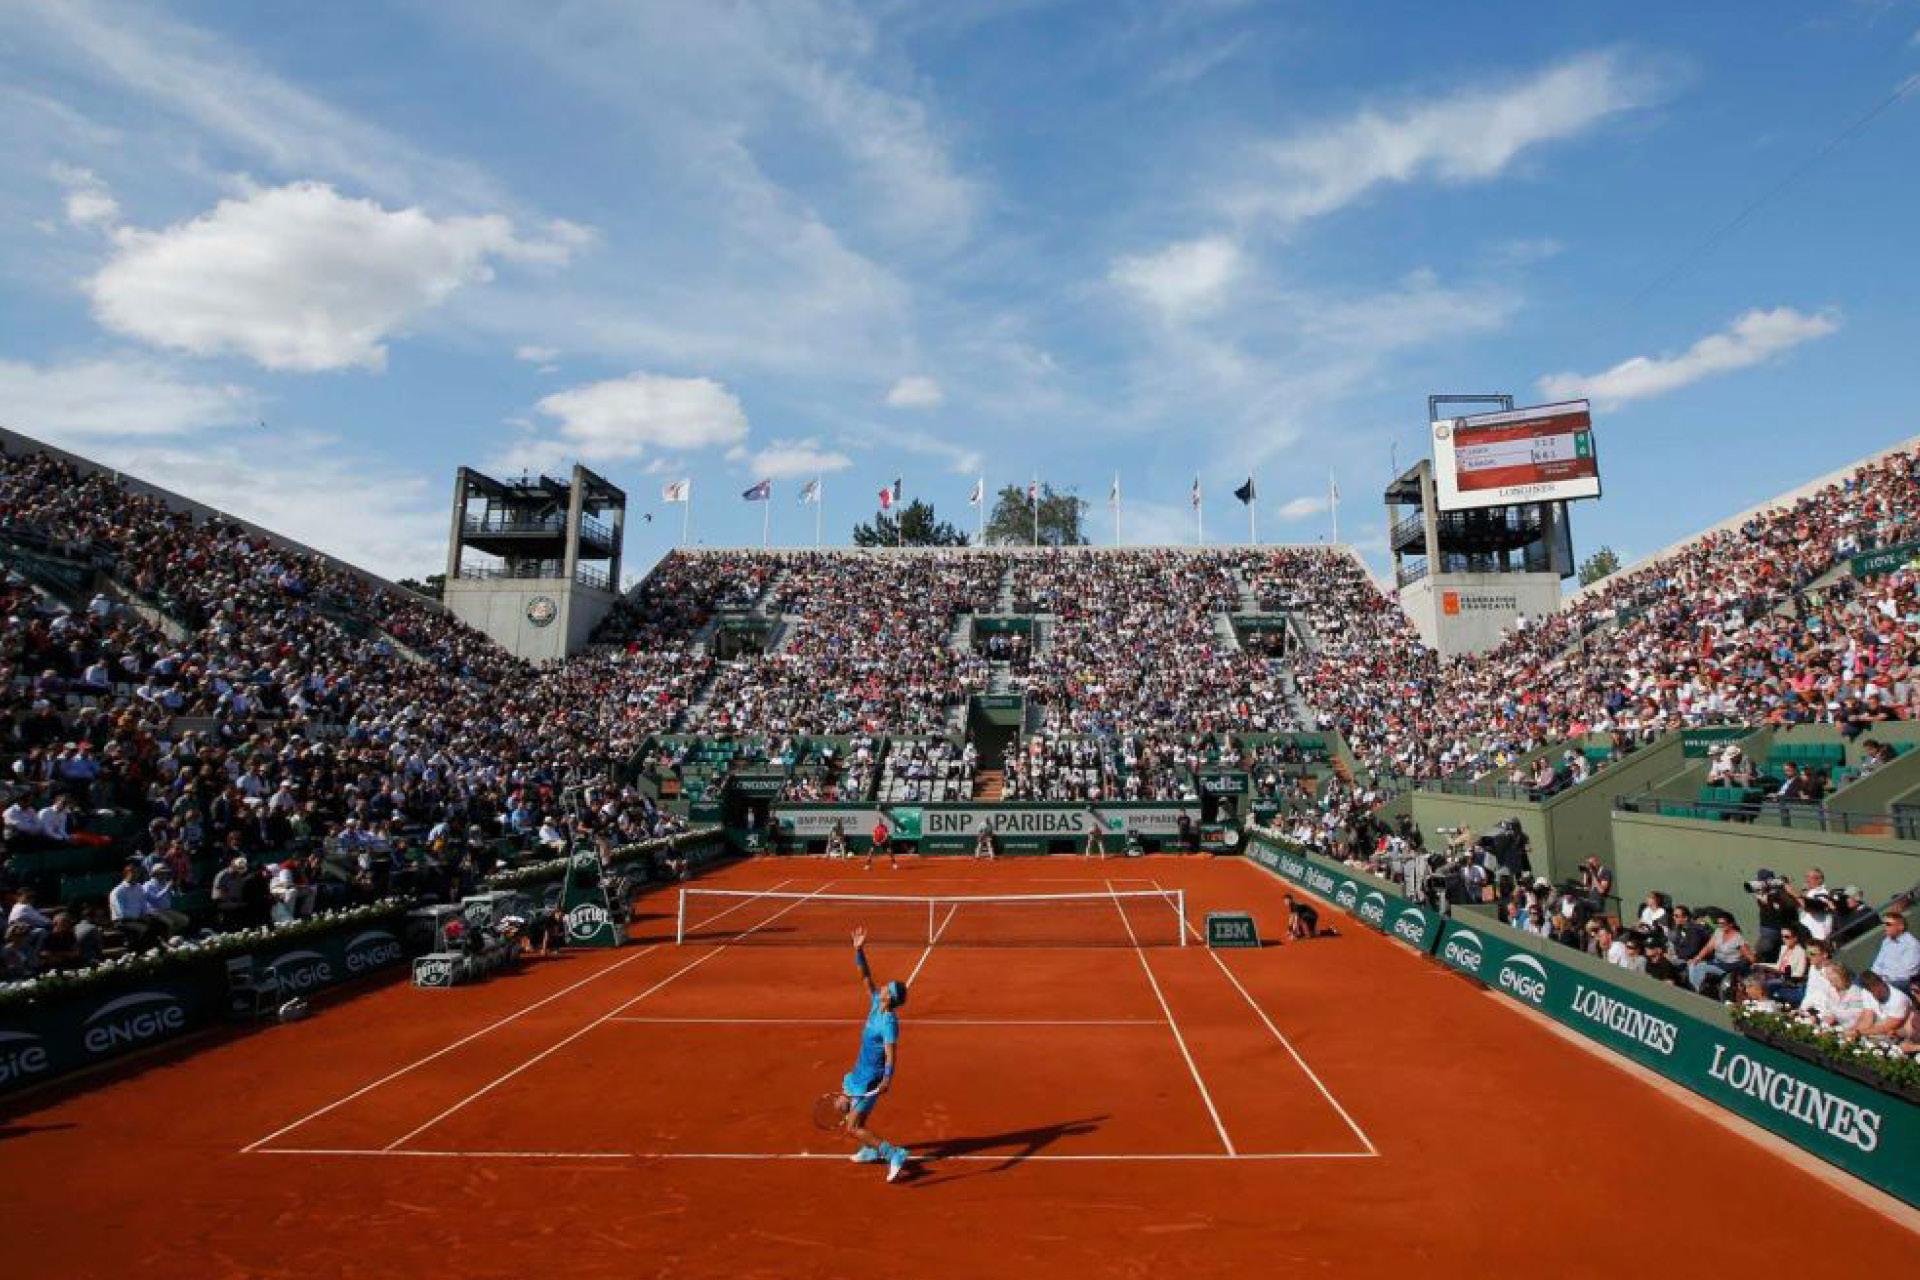 Roland Garros Images-3.jpg